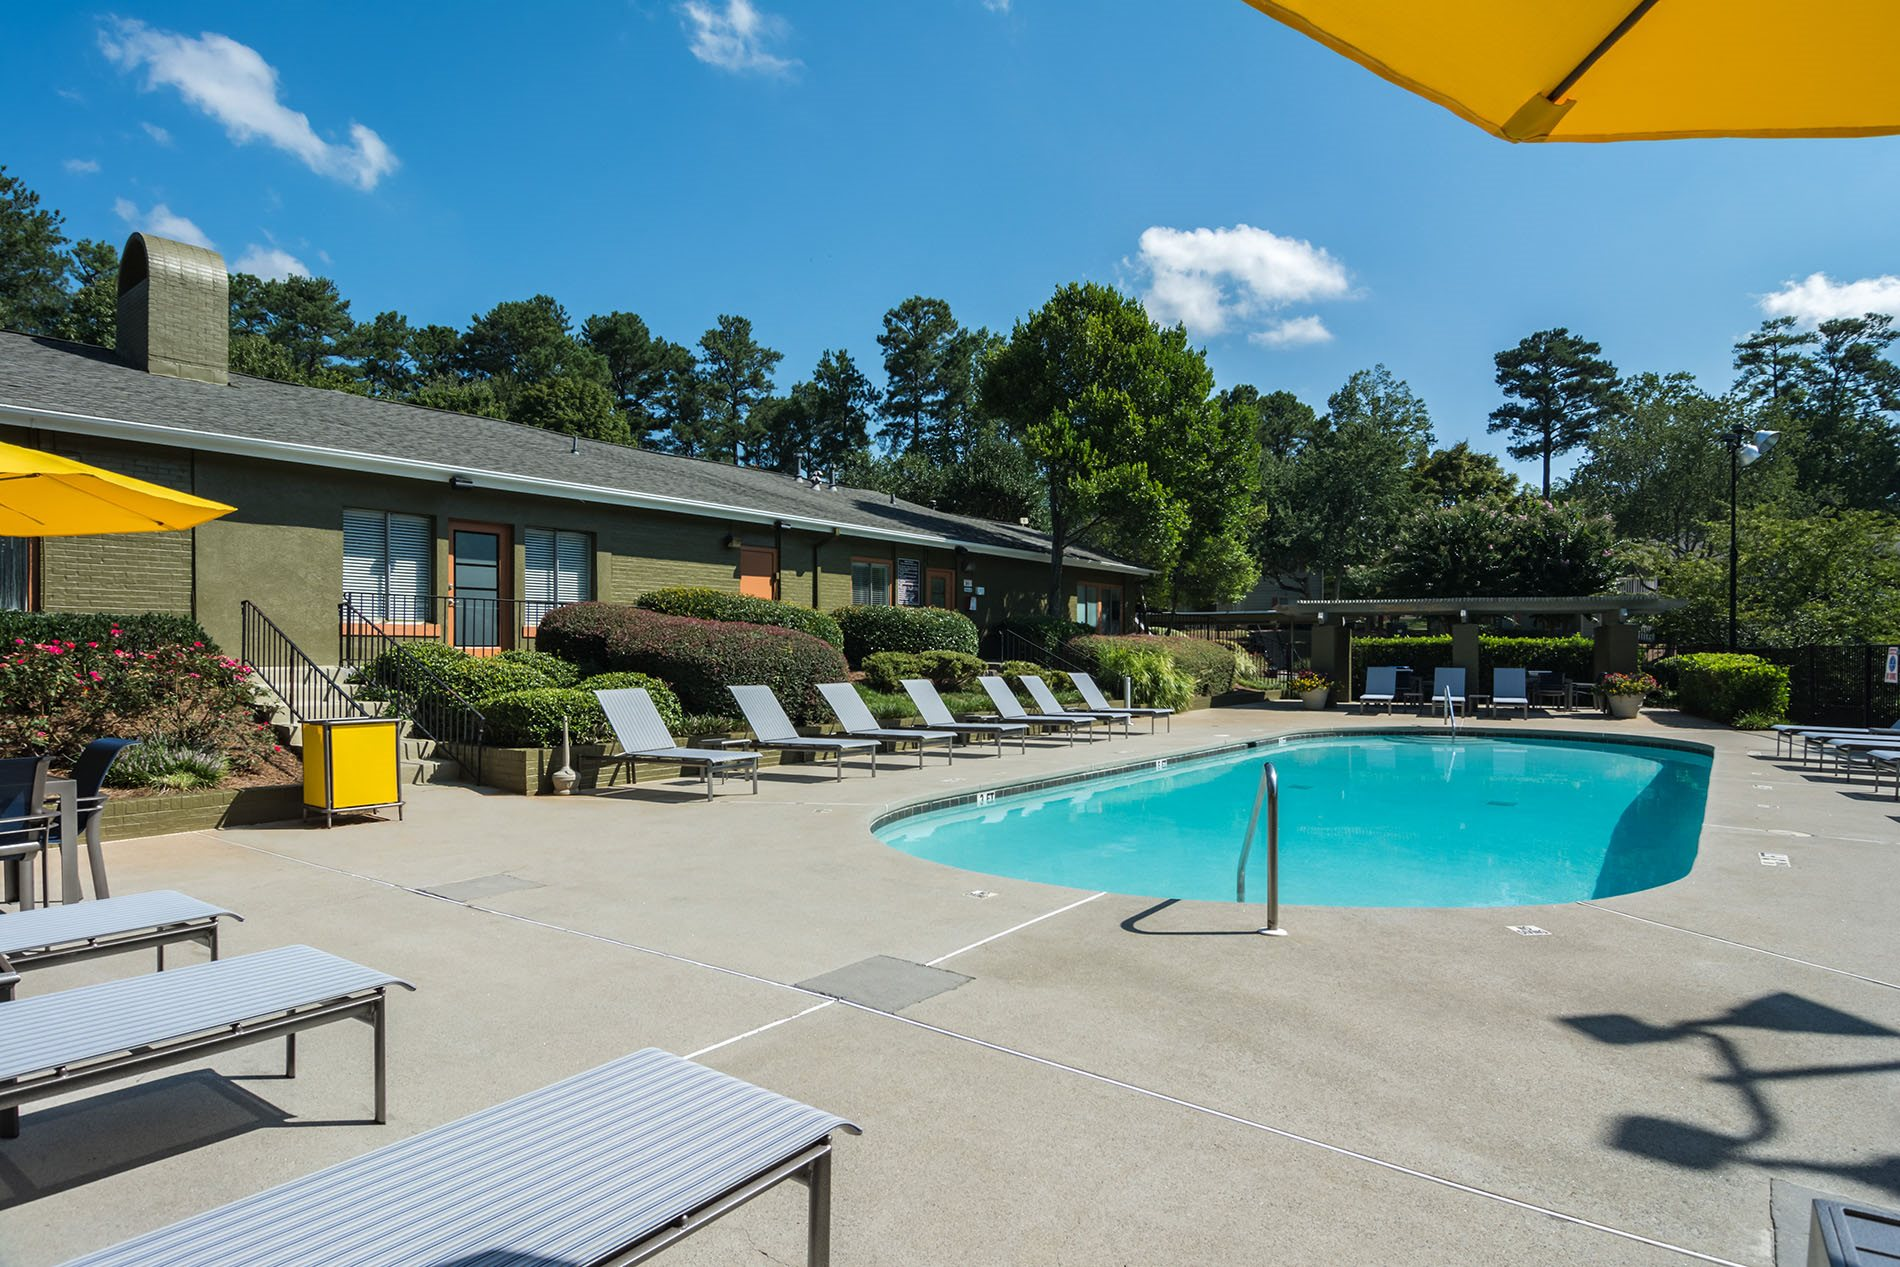 Swimming Pool at Dunwoody Pointe Apartments in Sandy Springs, Georgia, GA 30350